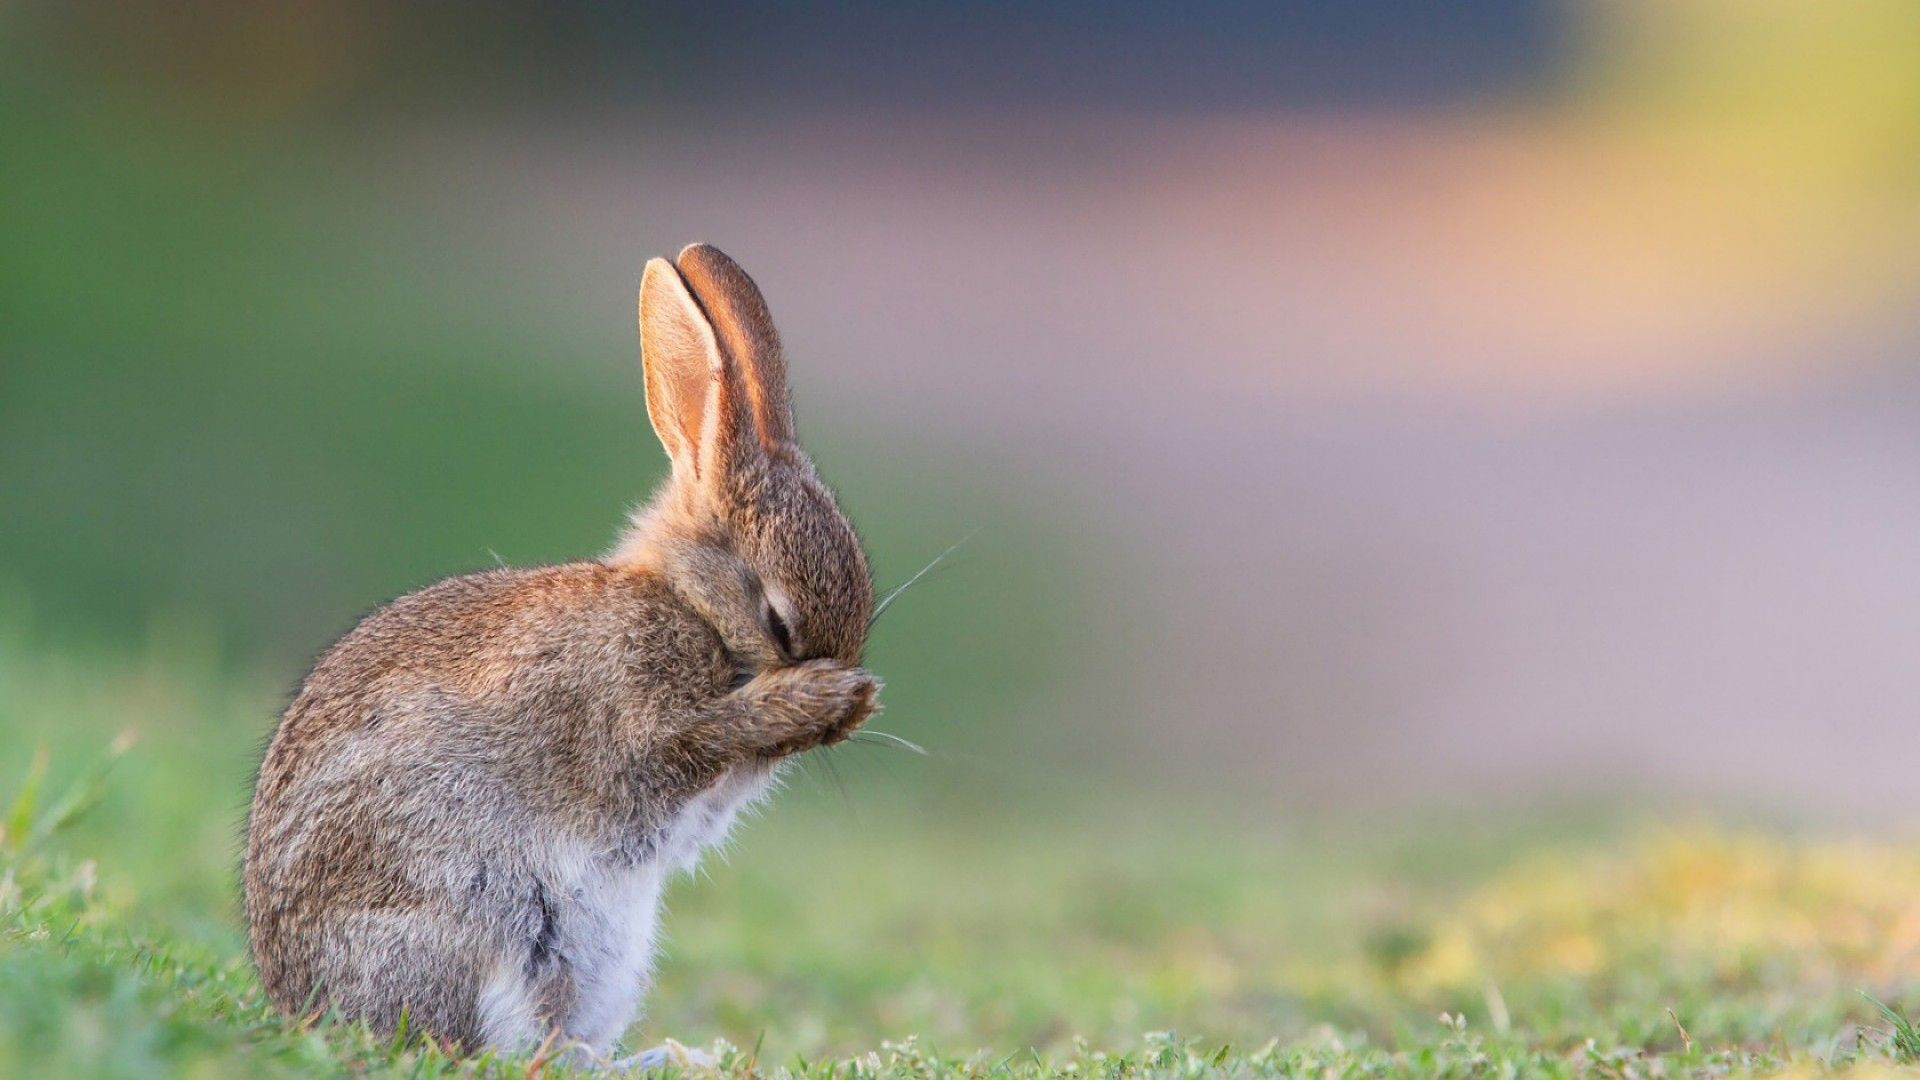 Bunny Download Wallpaper